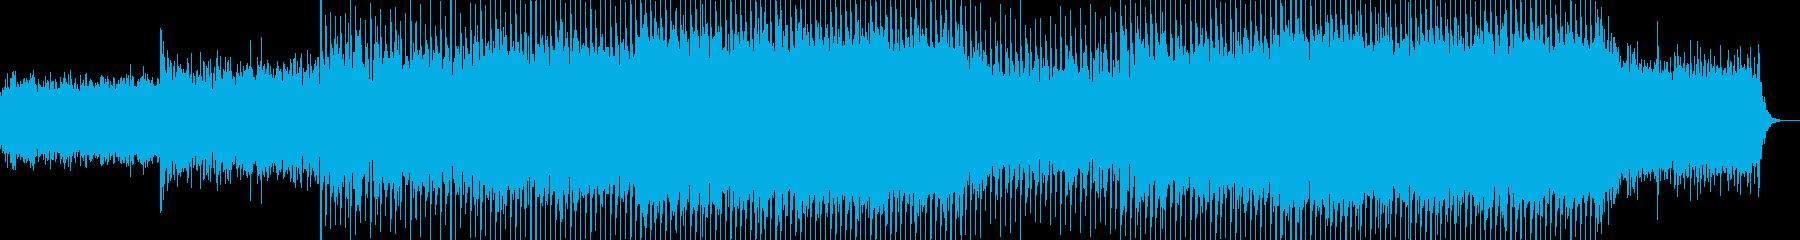 EDMポップで明るいクラブ系-39の再生済みの波形